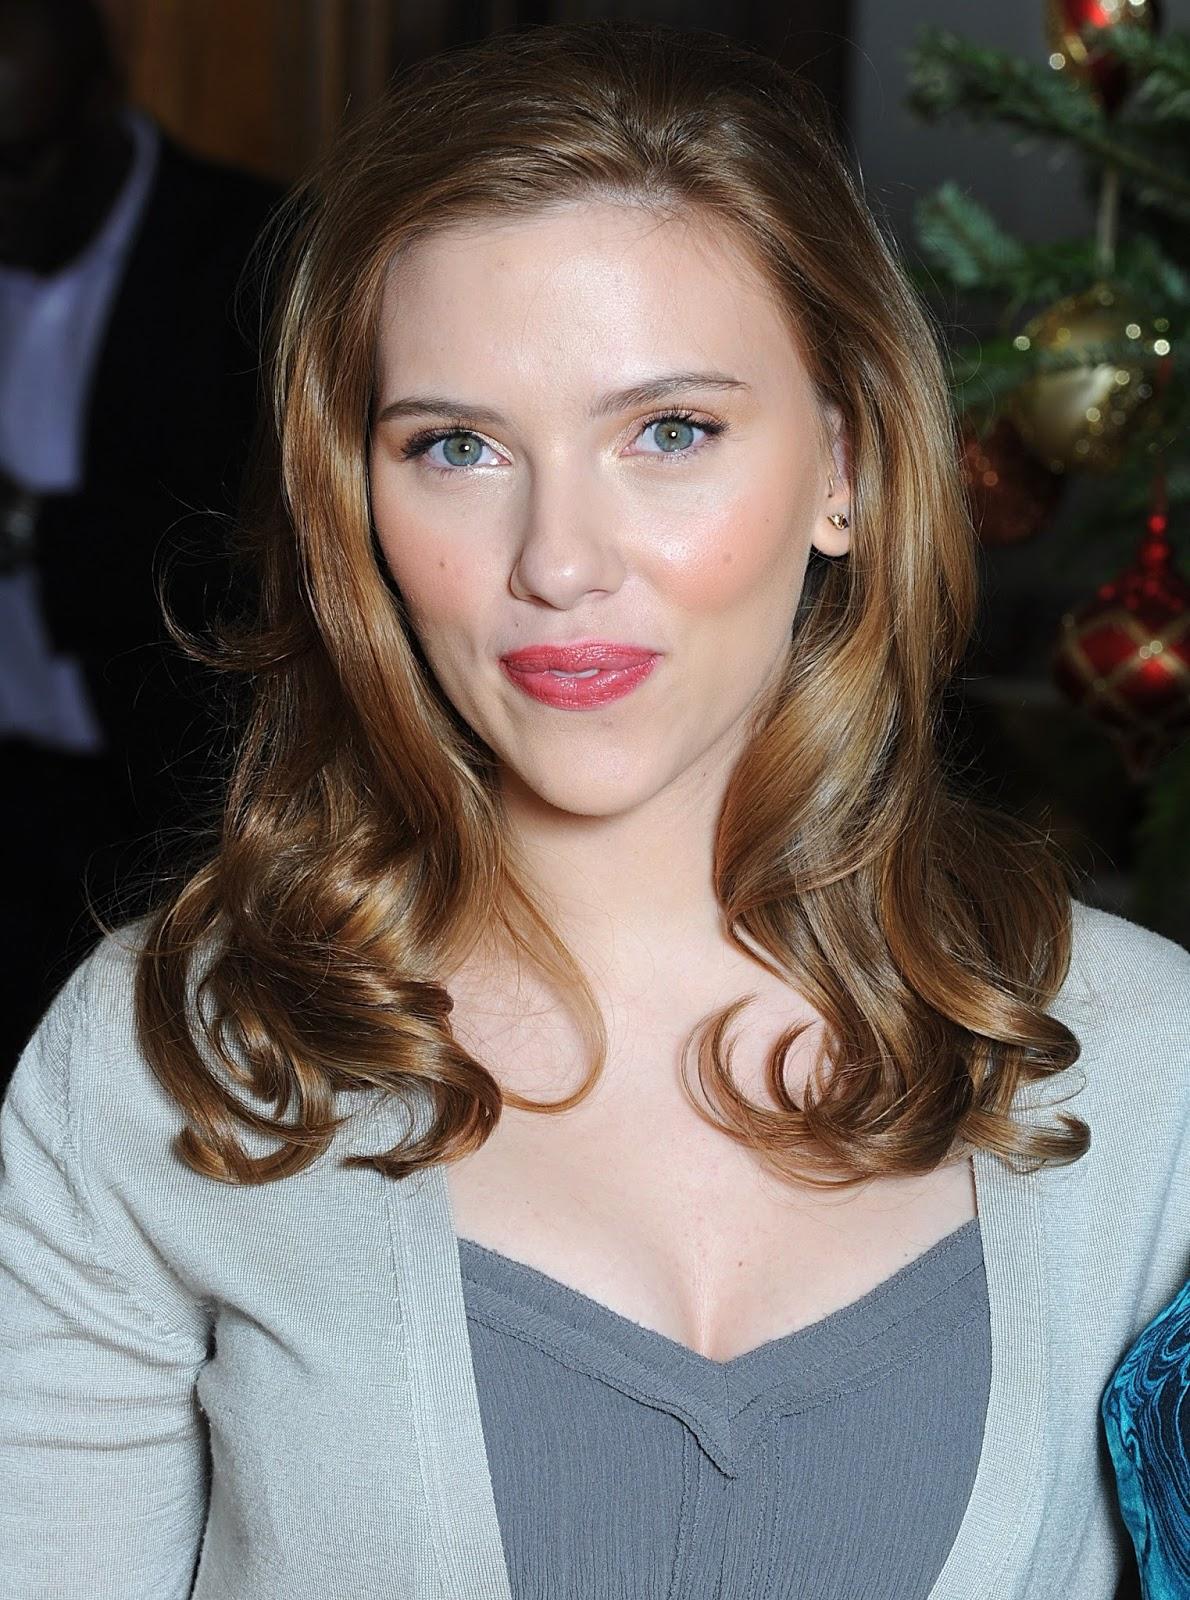 Ileana D Cruz Hd Wallpaper Global Pictures Gallery Scarlett Johansson Escote Hd